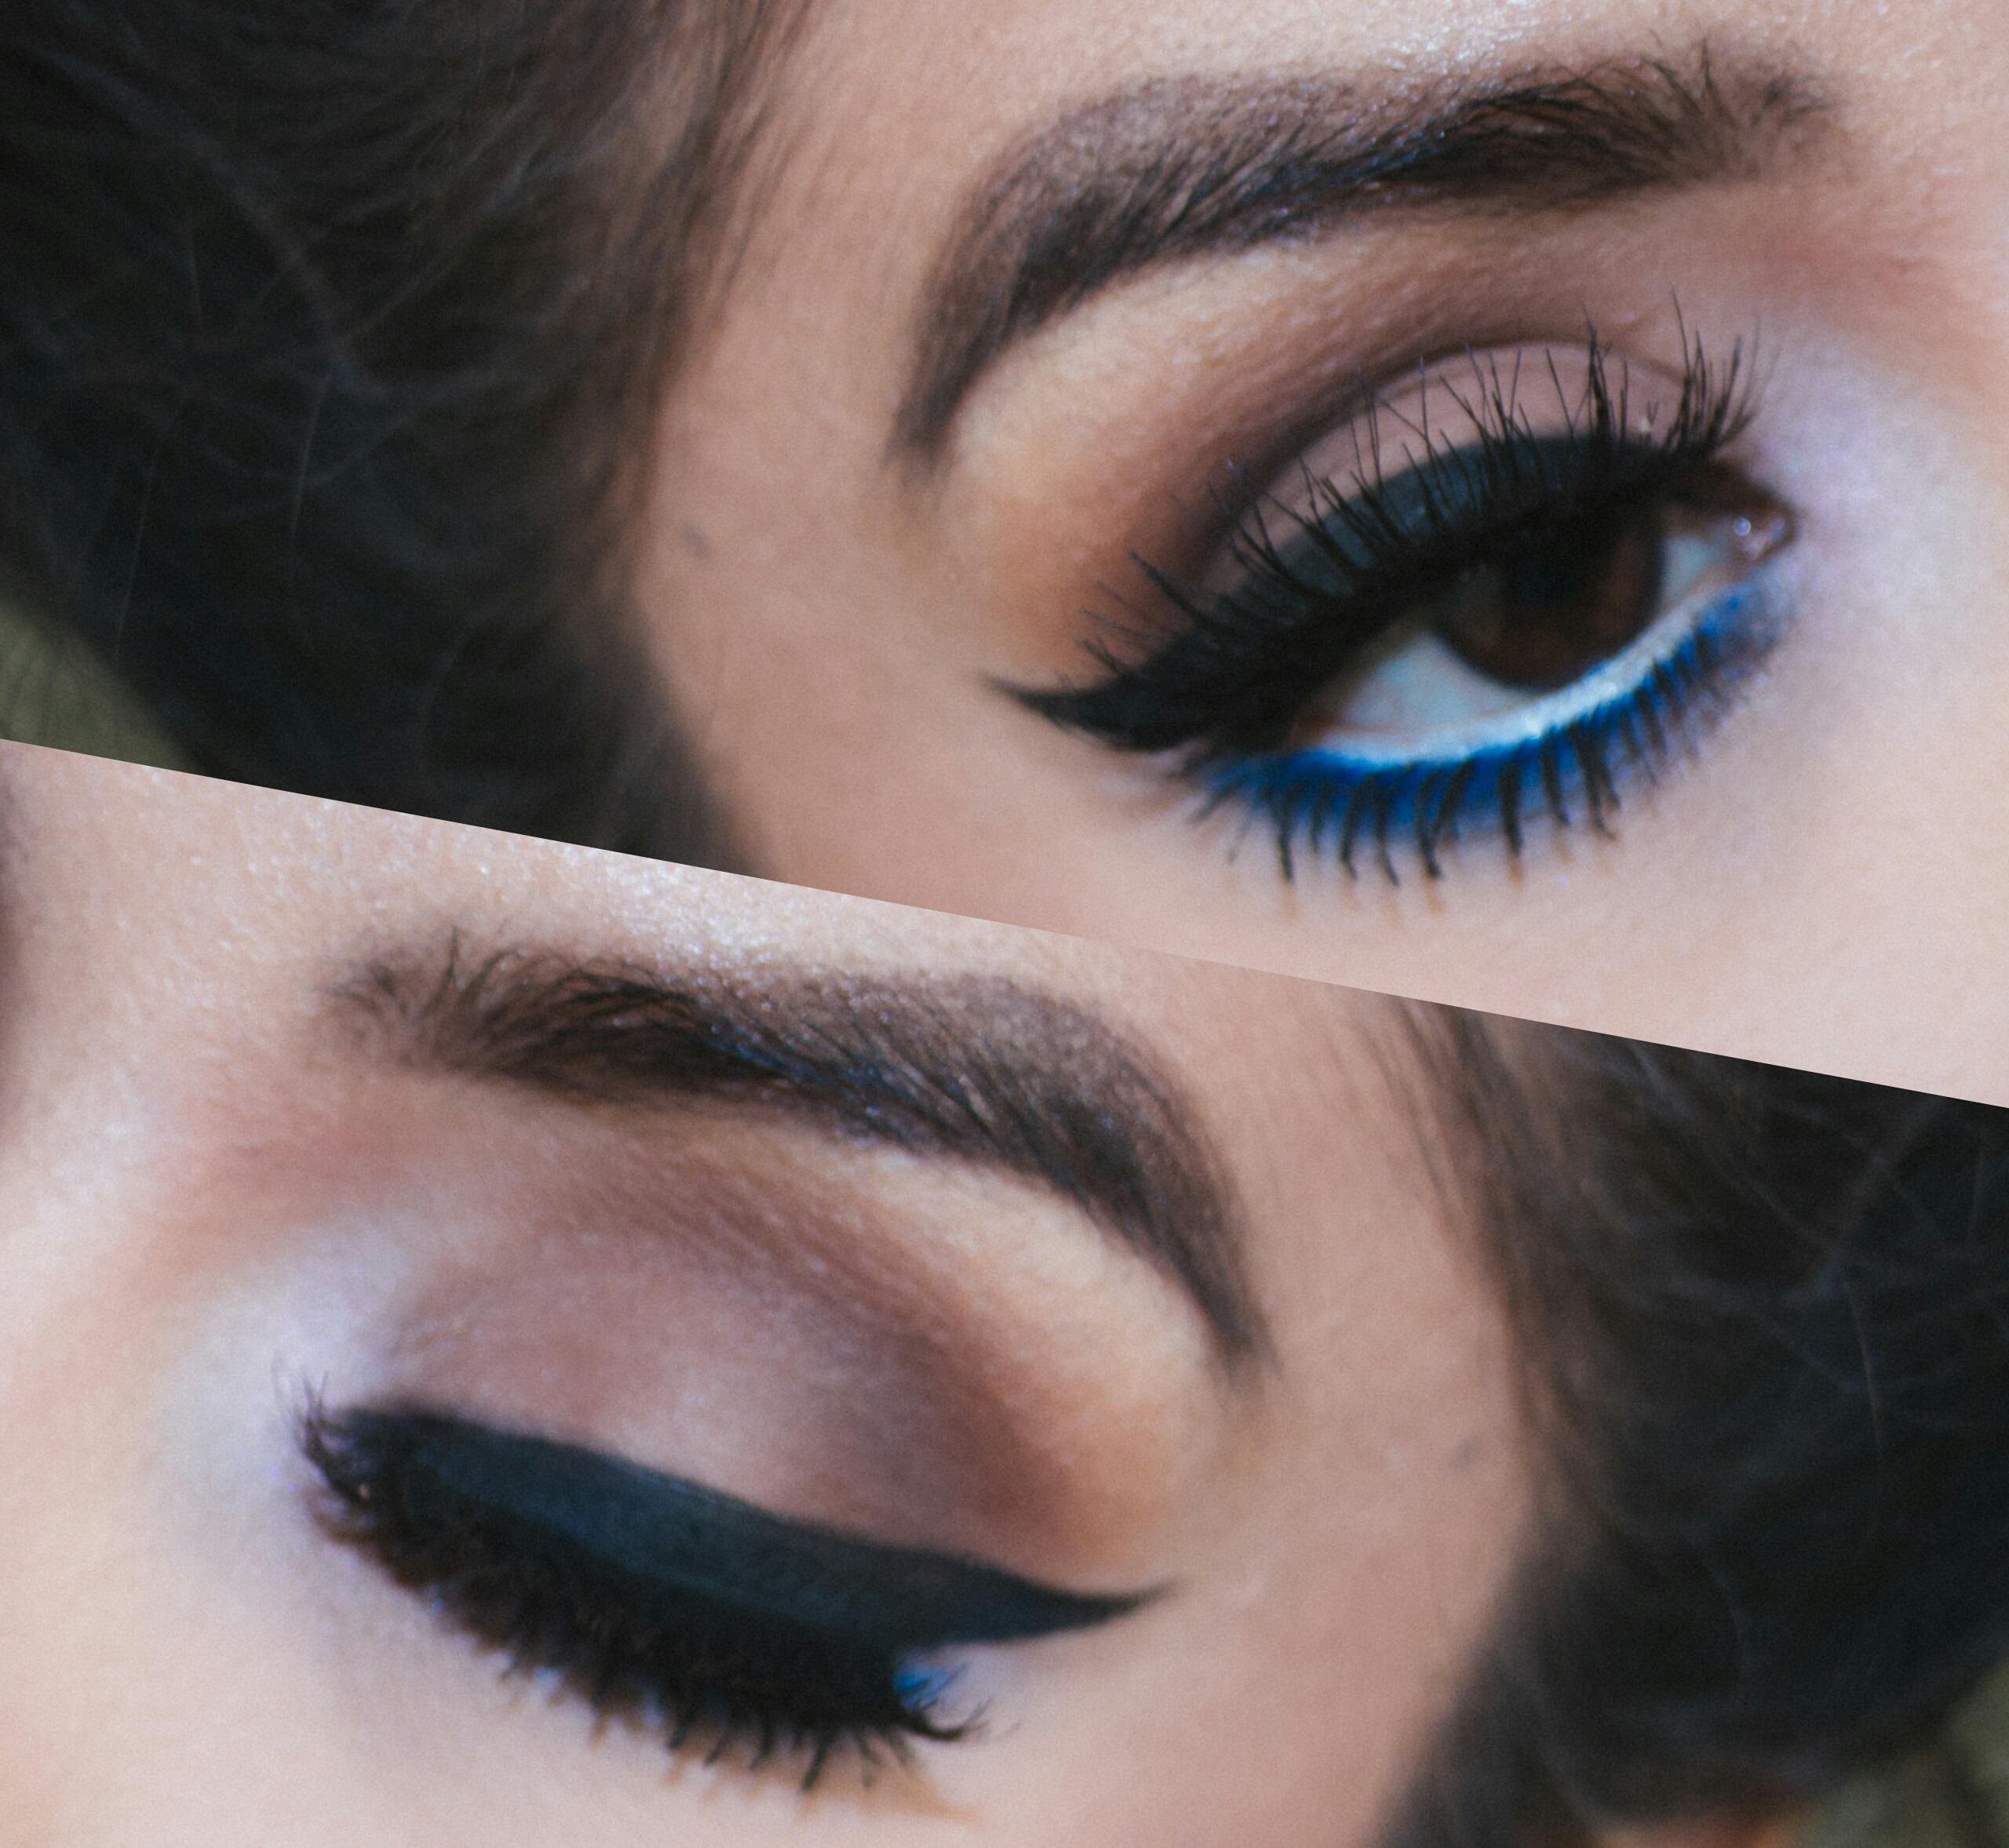 a54e6c9892b ... shadows blue eyeshadow MOTD Makeup Geek Cosmetics blue eyeshadow Koko  Lashes Queen B lashes Nyx Cosmetics Ardell Lashes ABH ...